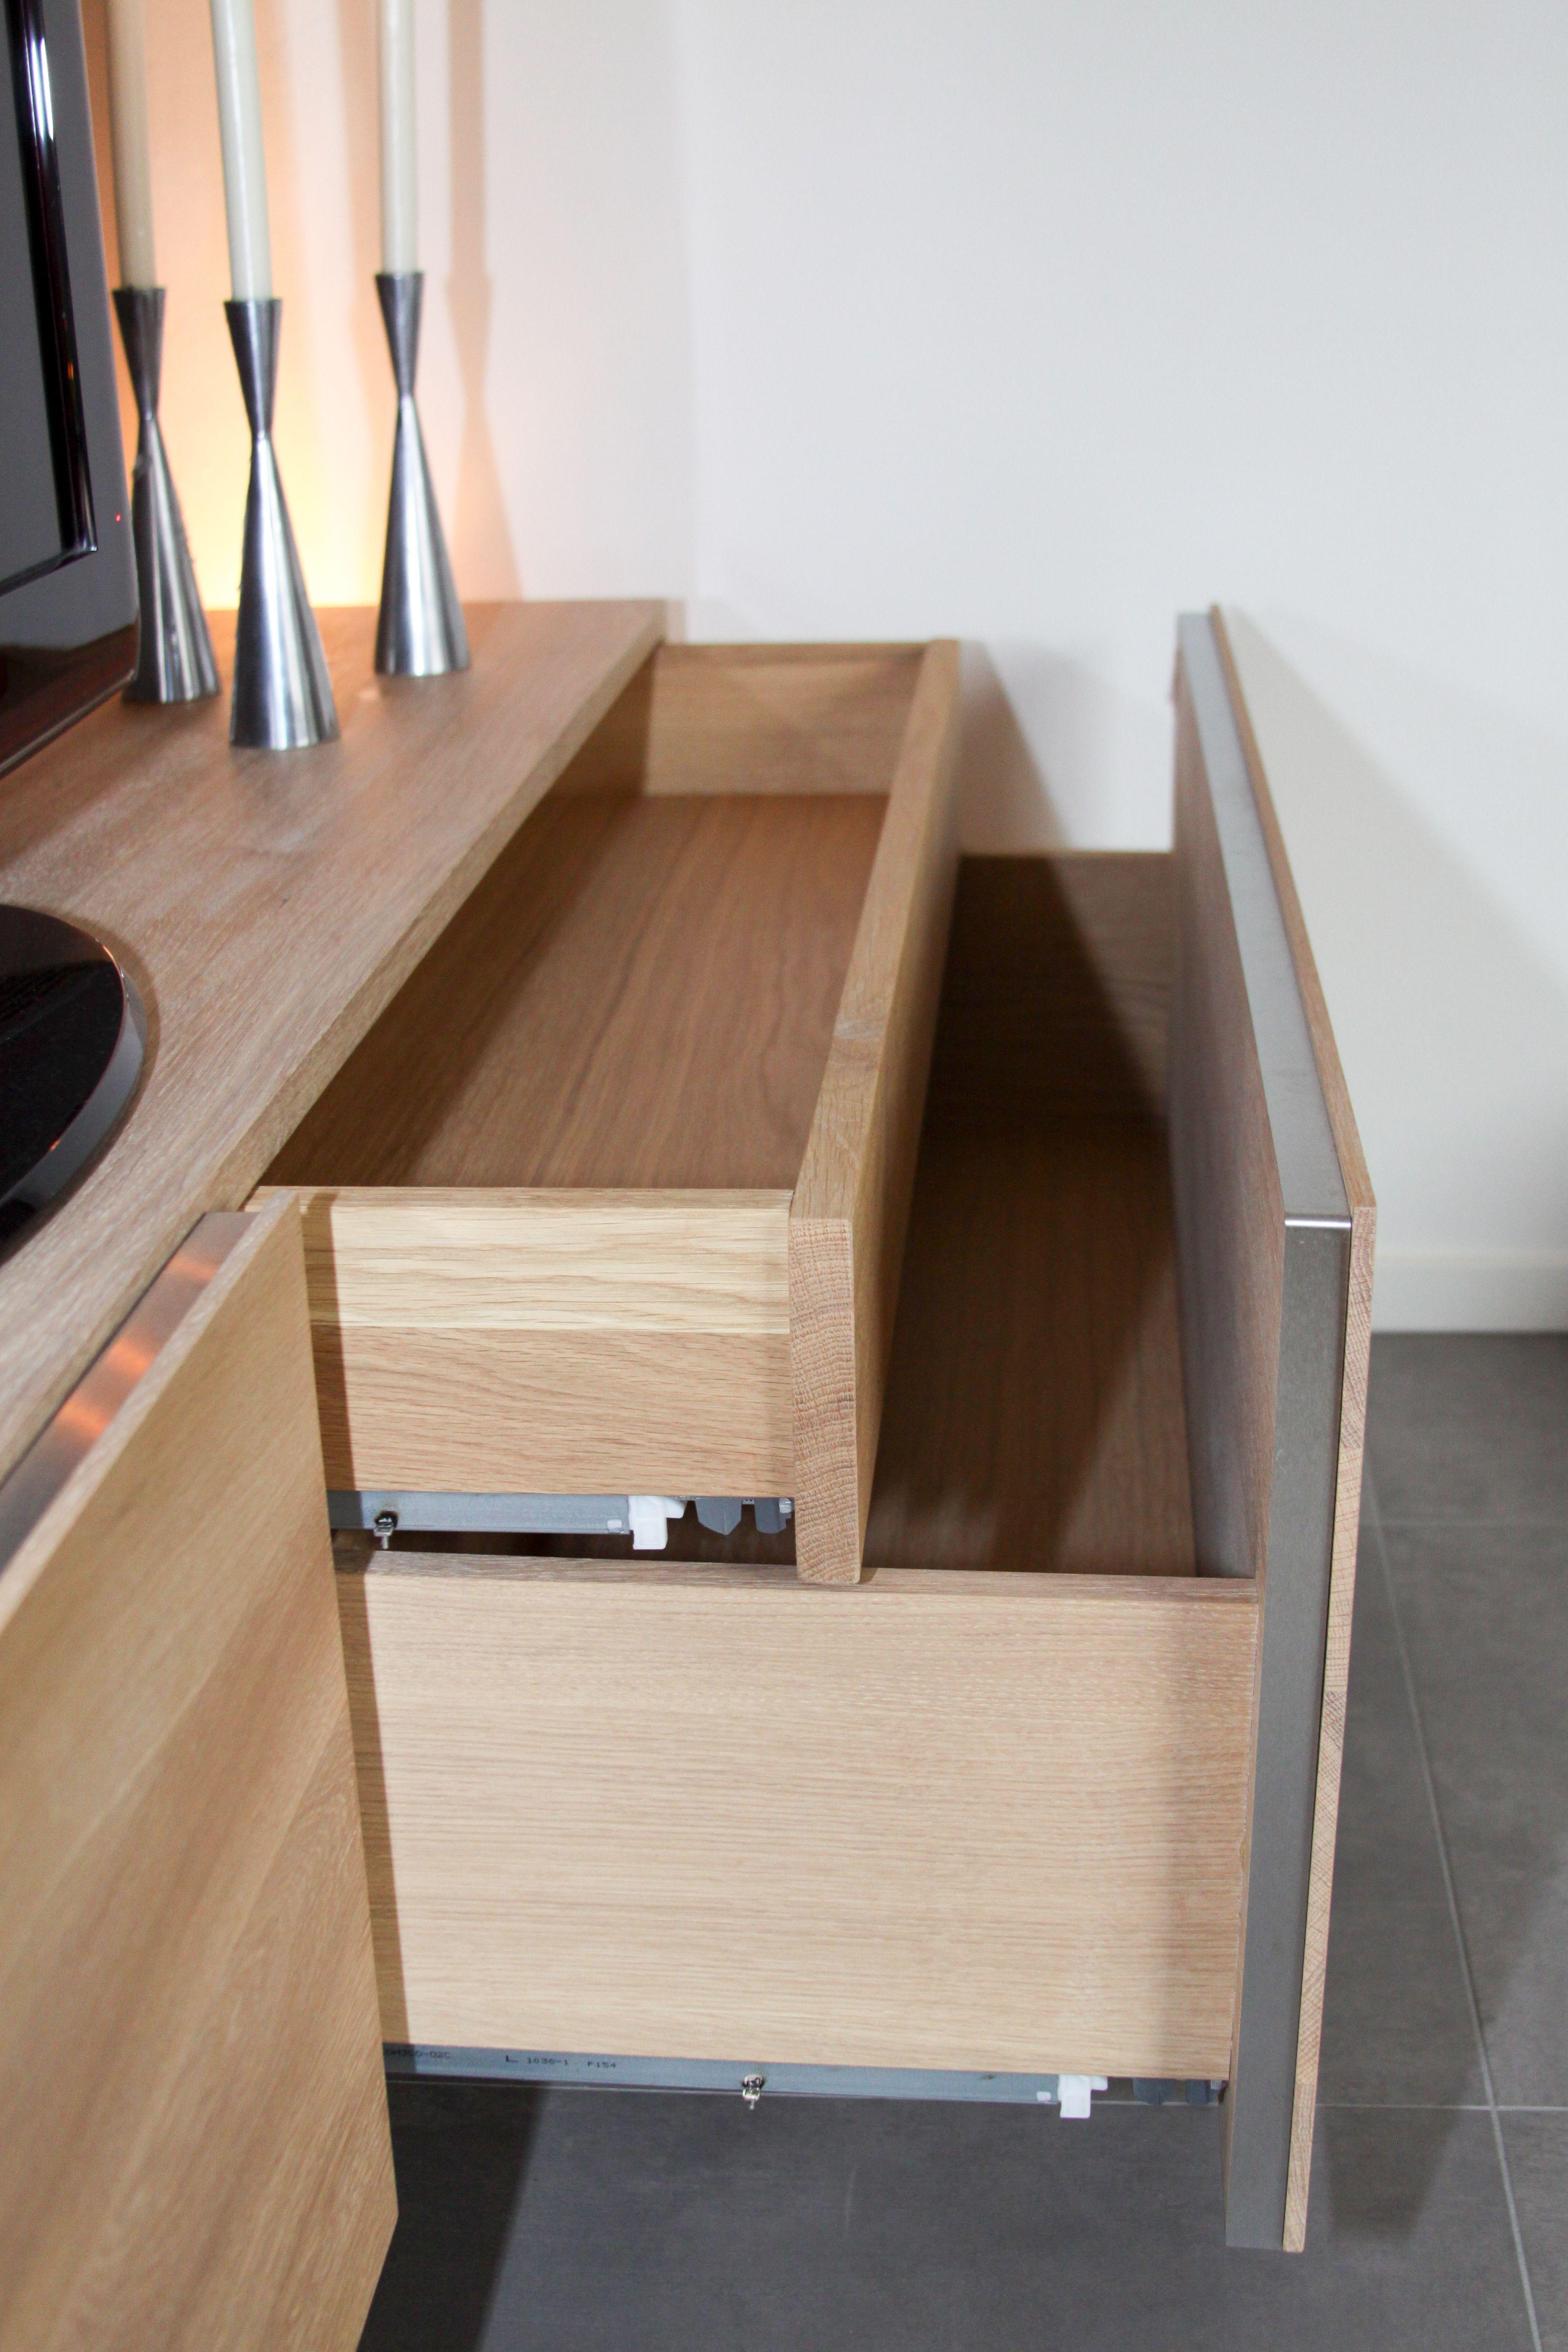 Massief Noten Tv Meubel.Zwevend Design Tv Meubel Medium Box In Massief Eiken Met Lades